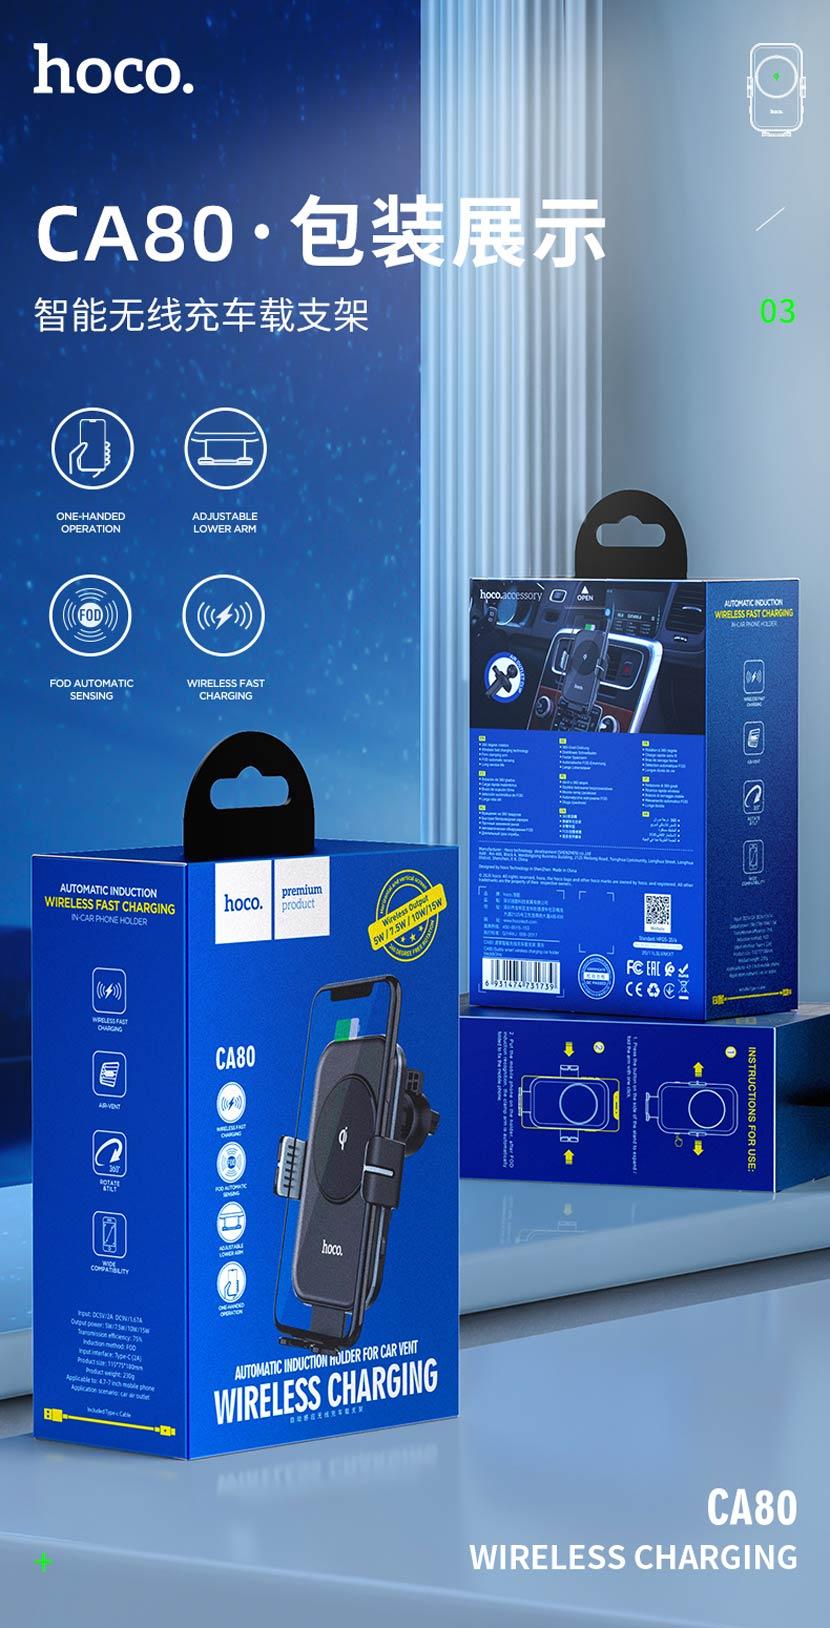 hoco news ca80 buddy smart wireless charging car holder package cn